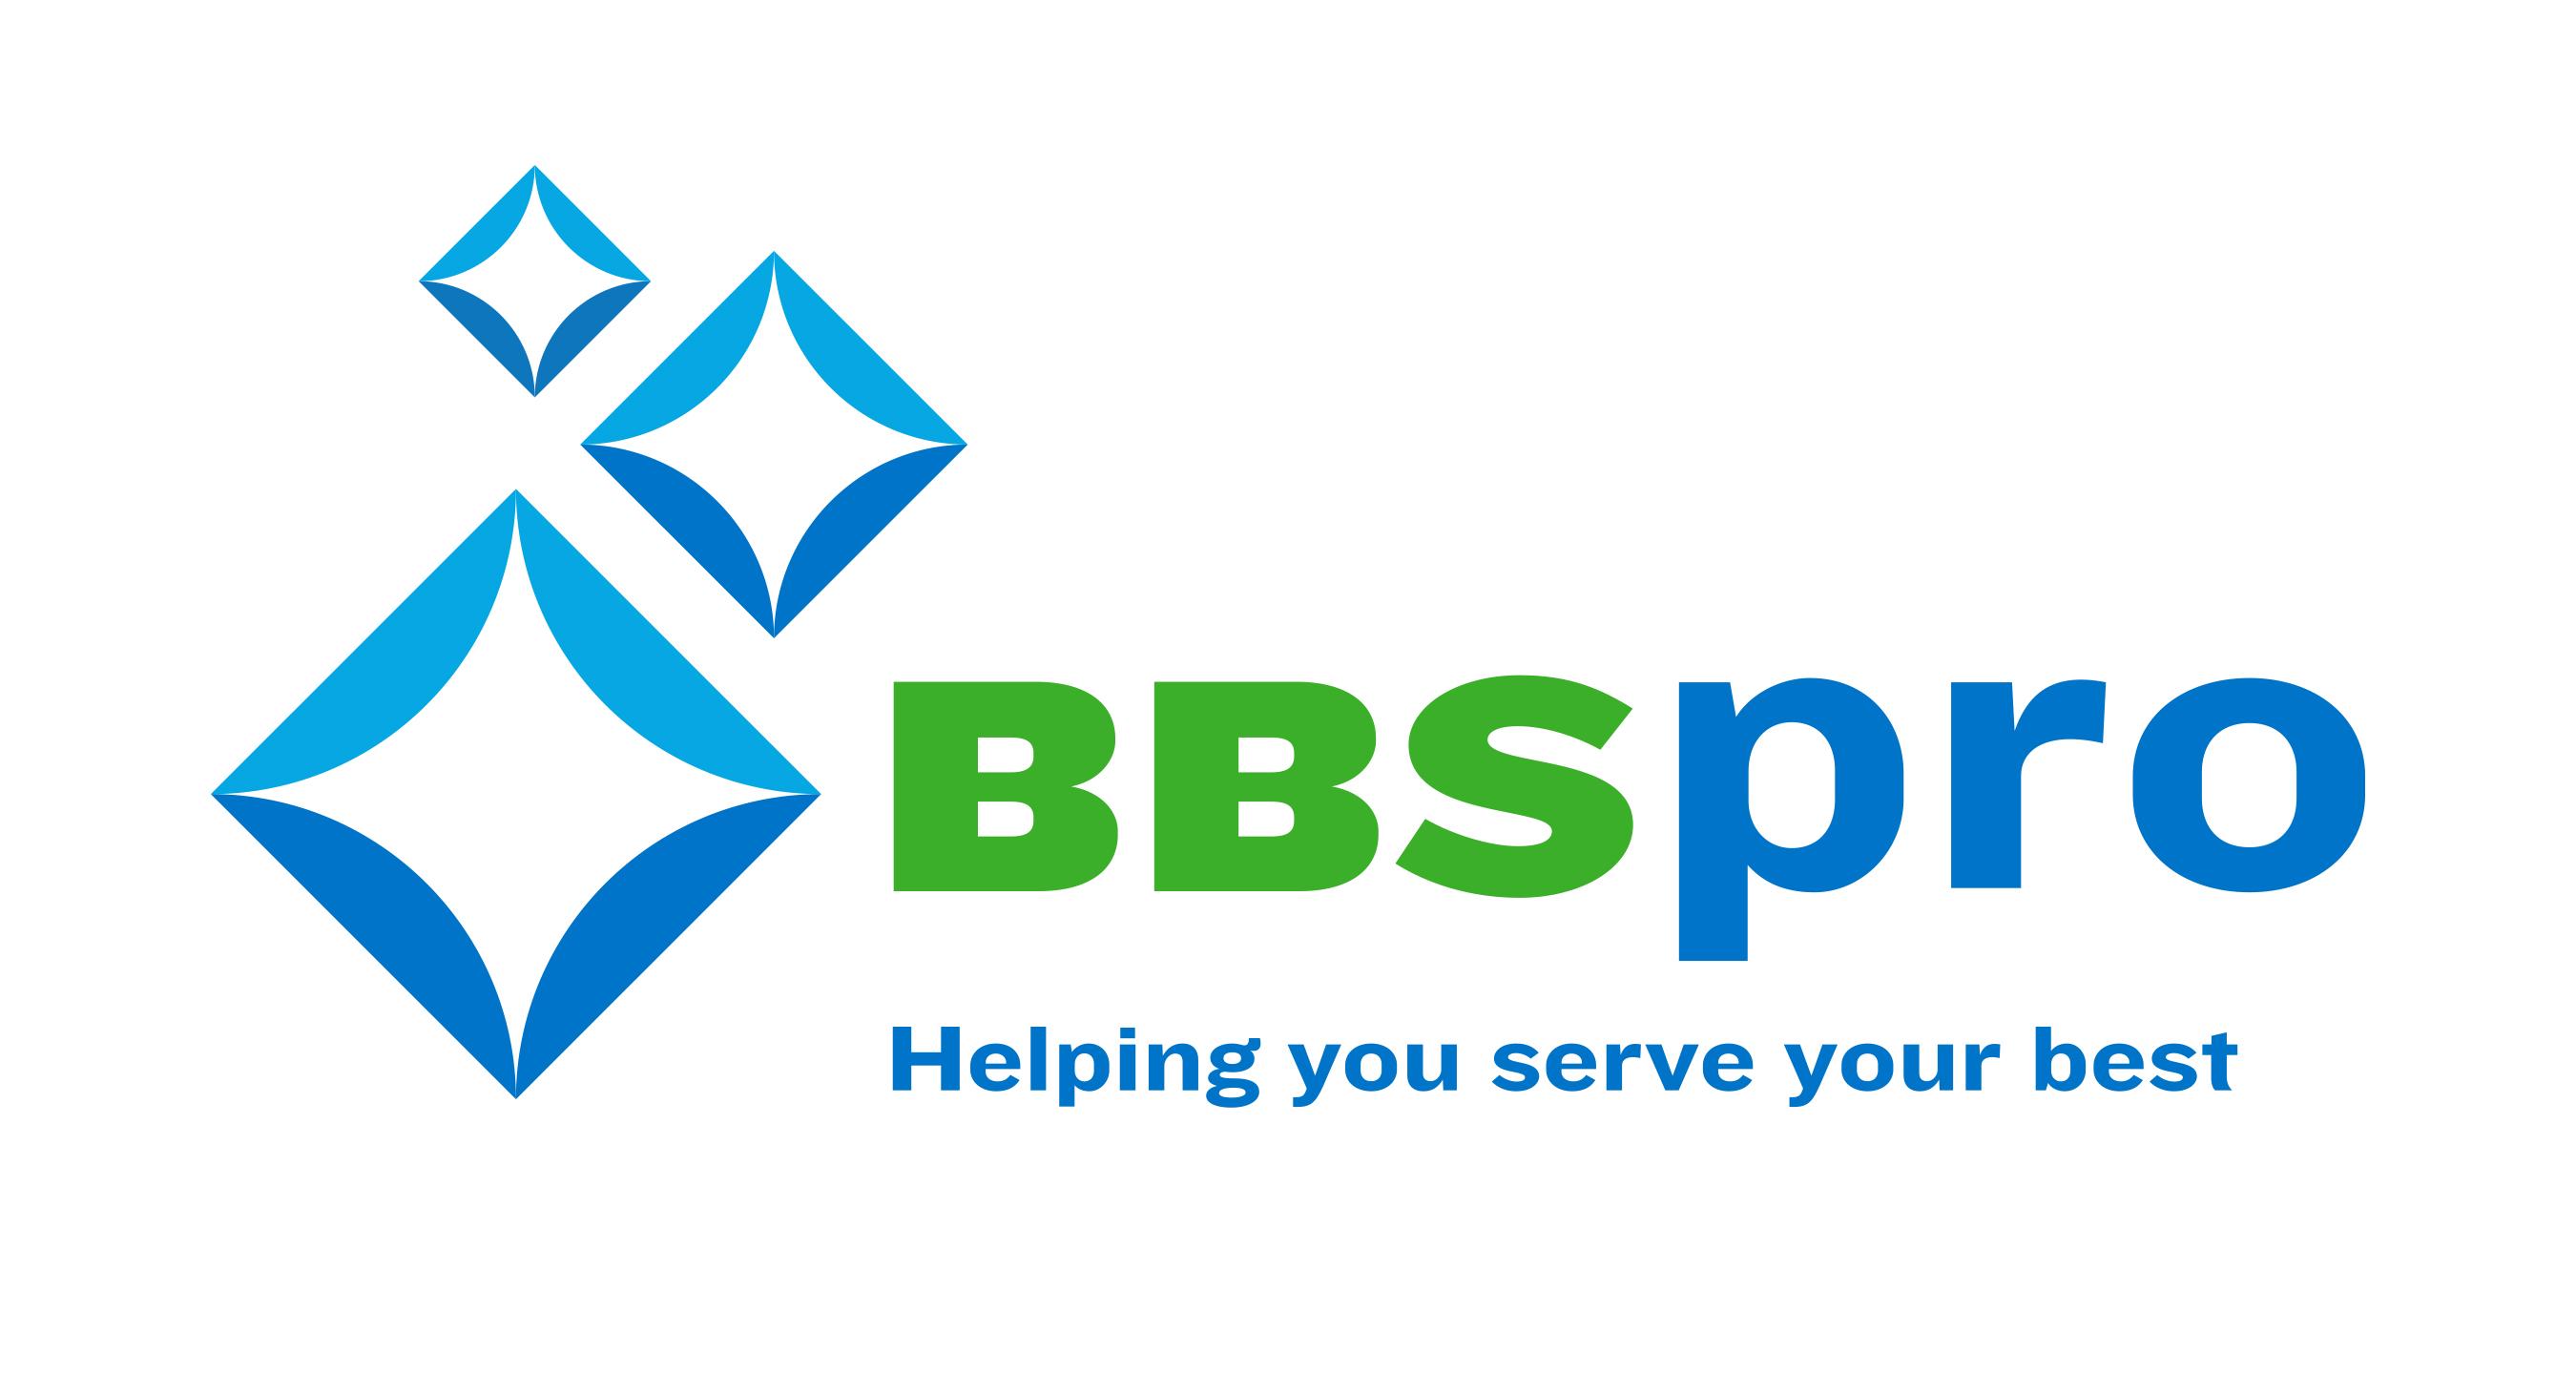 BBSpro Services Logo